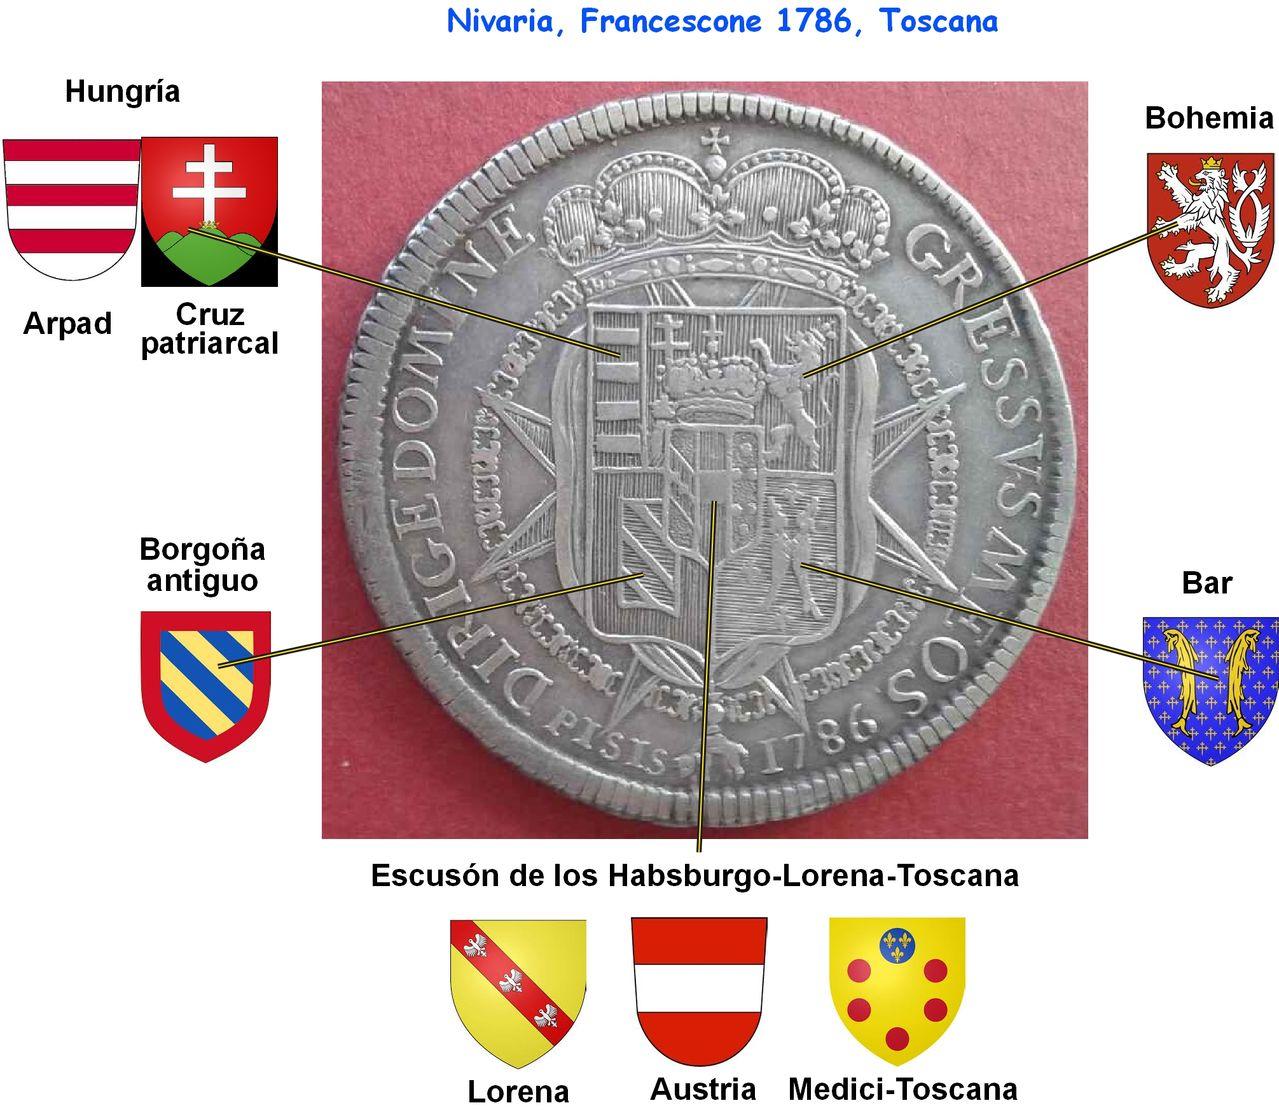 Francescone 1786 Toscana - Escudo para el freehand de Lanzarote Escudo_nivaria_toscana_desglosado